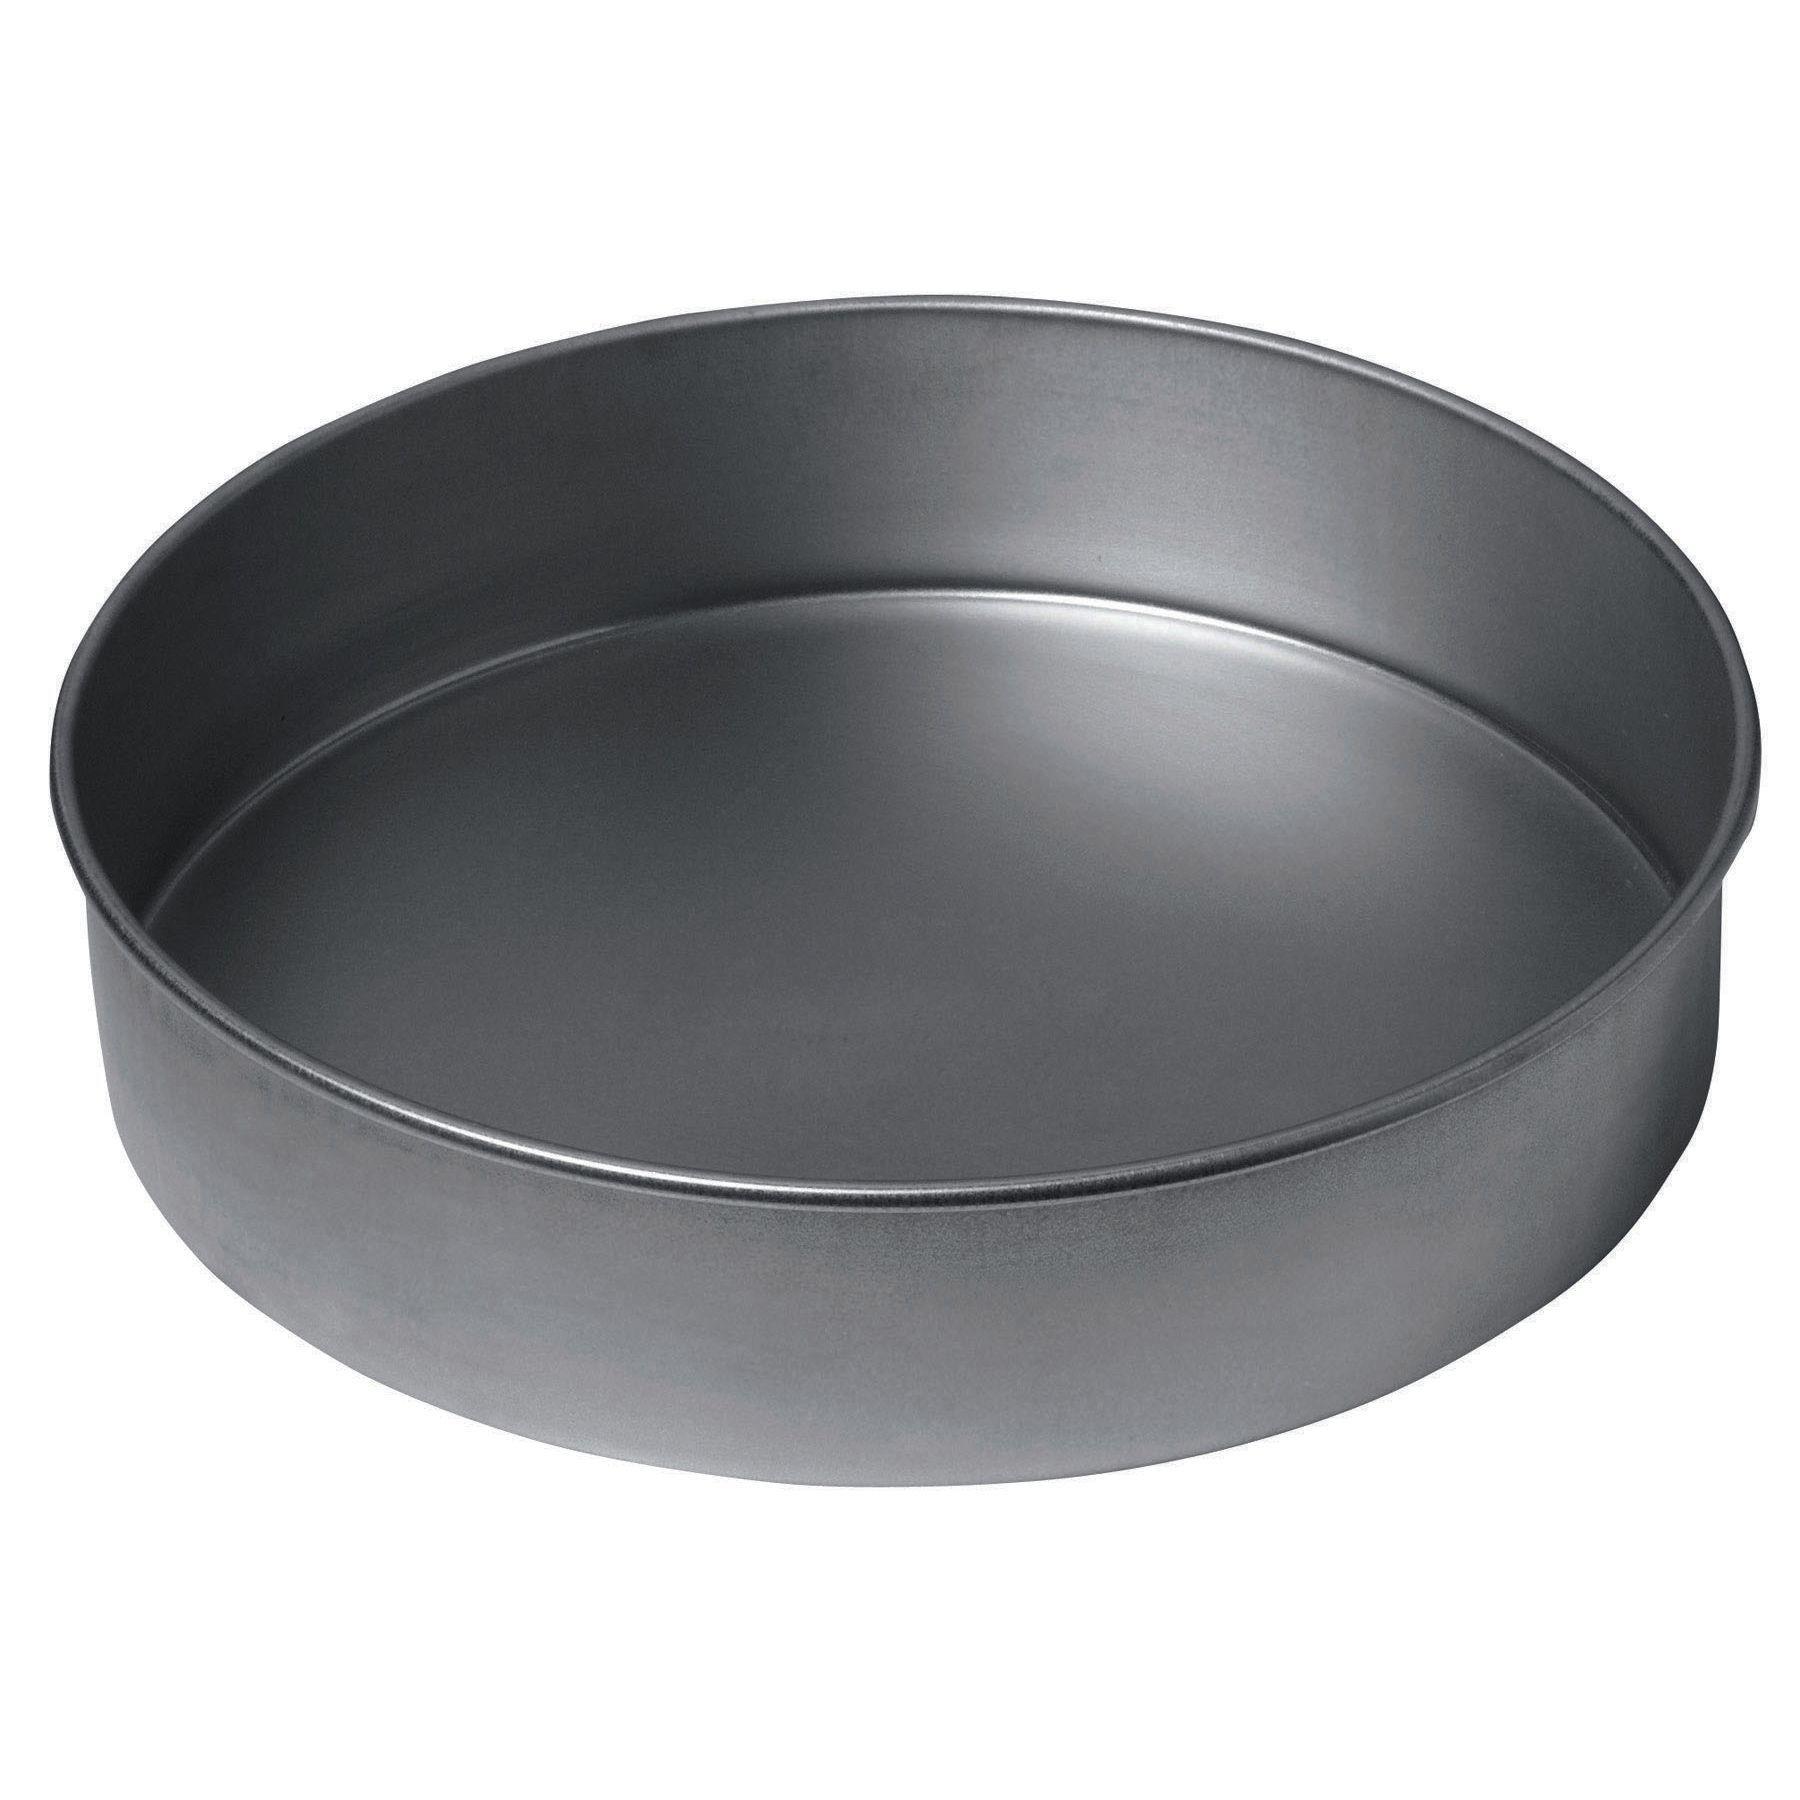 17+ 9 inch round cake pan volume trends